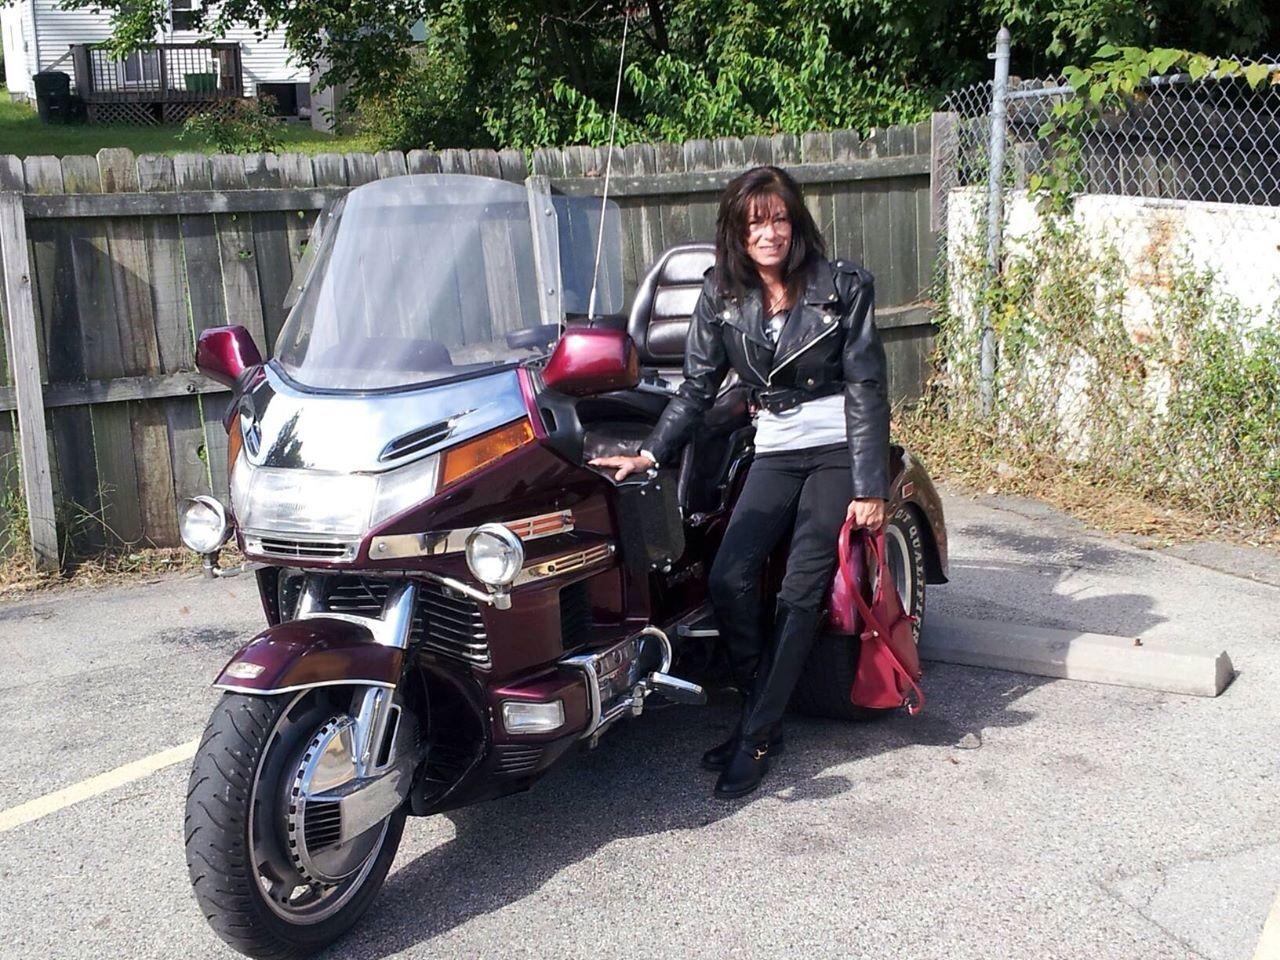 0ce32e897cbbf000cff07956c306a4eb www motosikletaksesuarlari com dainese deri bayan  at creativeand.co